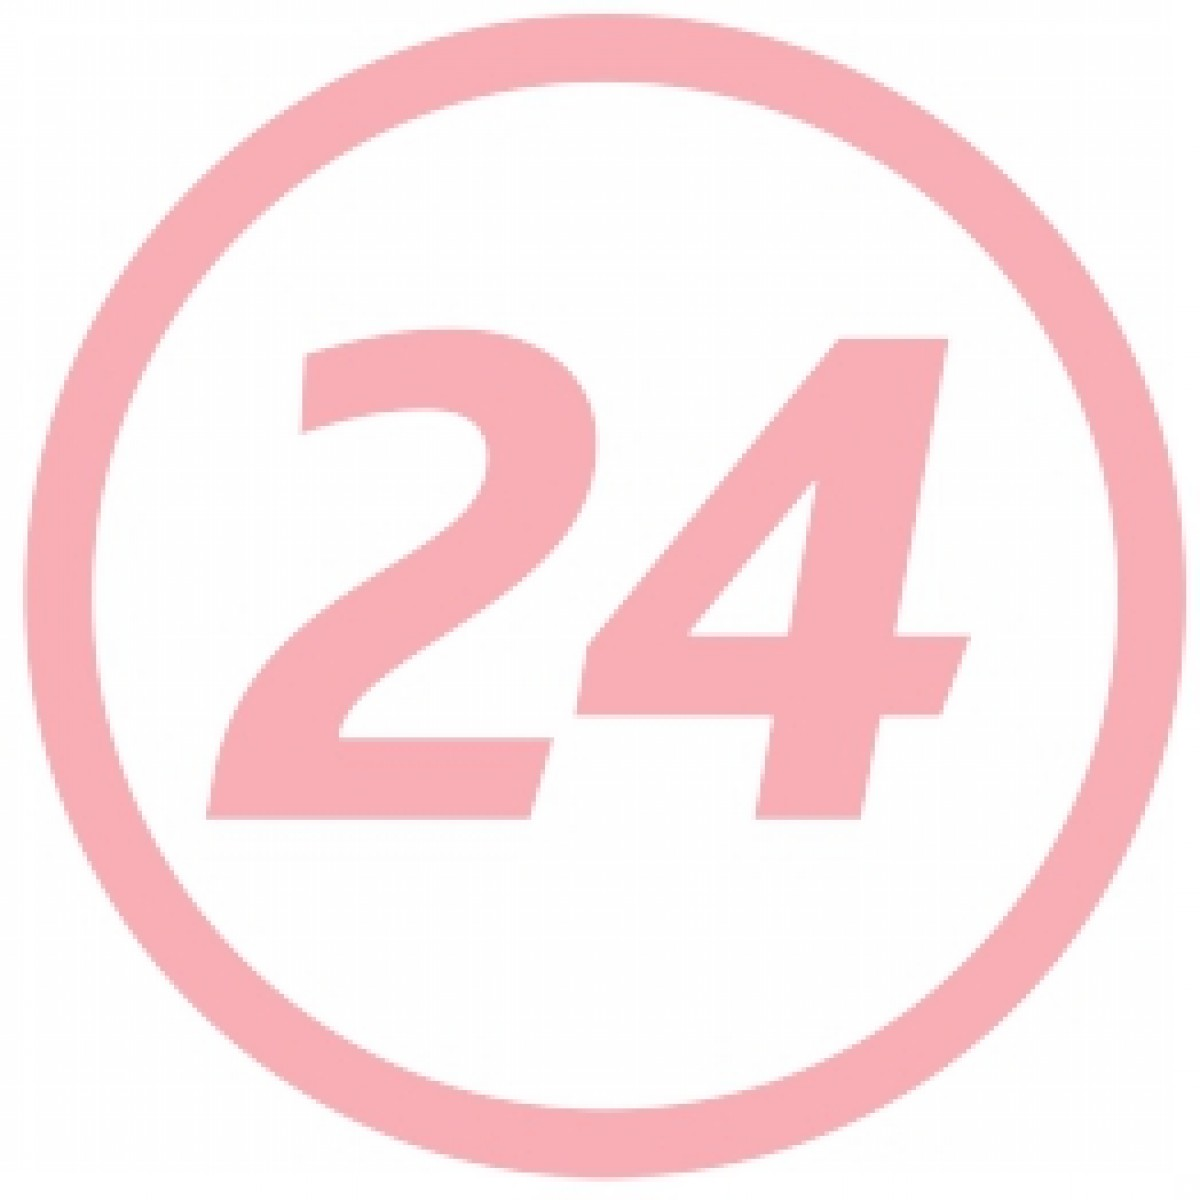 4Lax Adulti Supozitoare cu Glicerina 2500mg, Supozitoare, 12buc